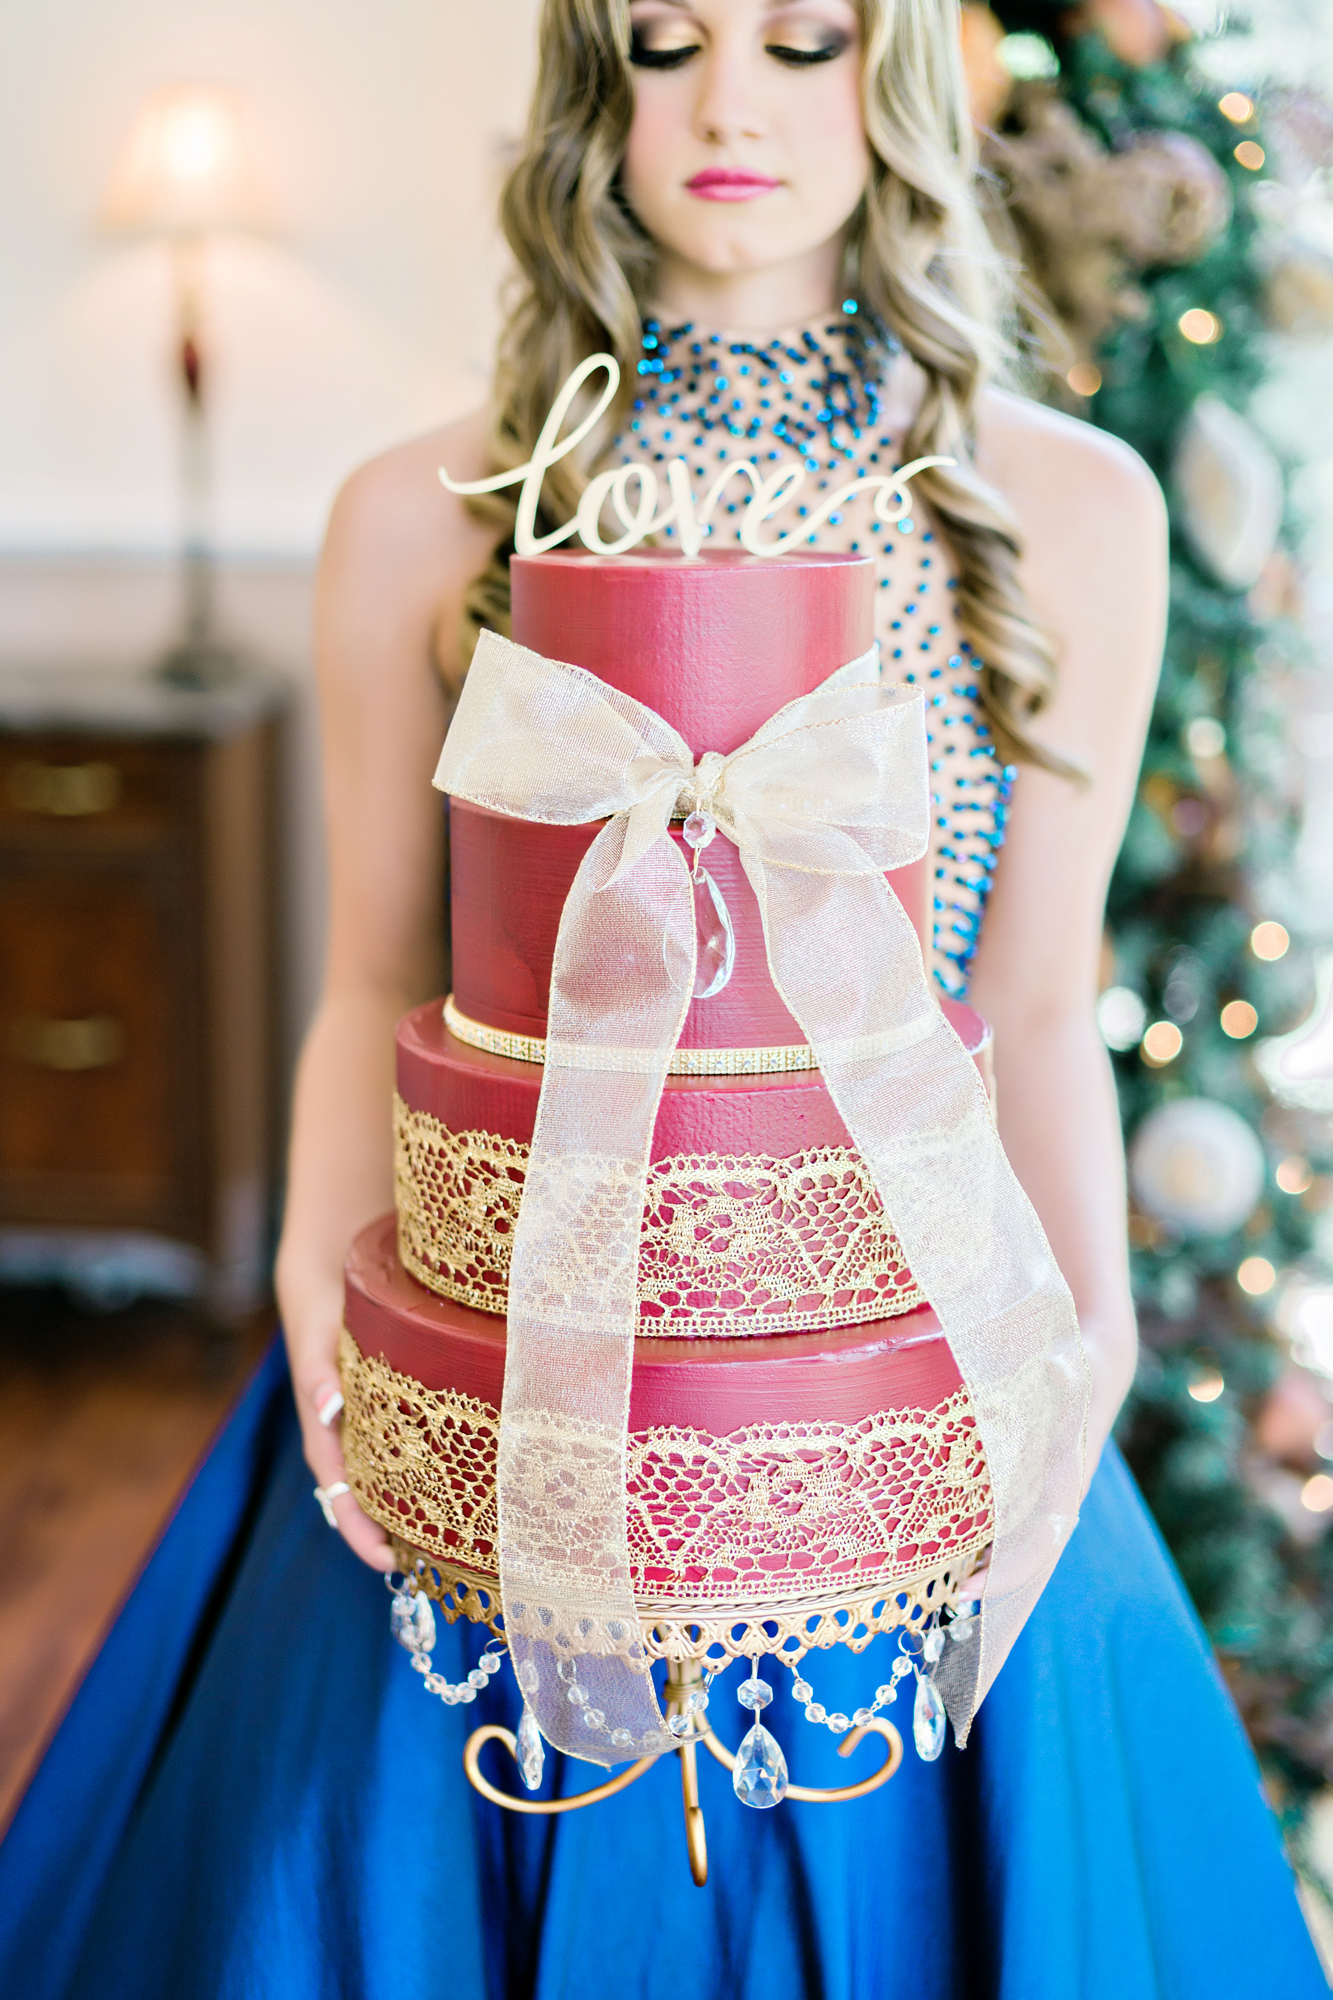 Opulent Treasures Cake Stands Andie Freeman Photo Holiday Wedding03.jpg